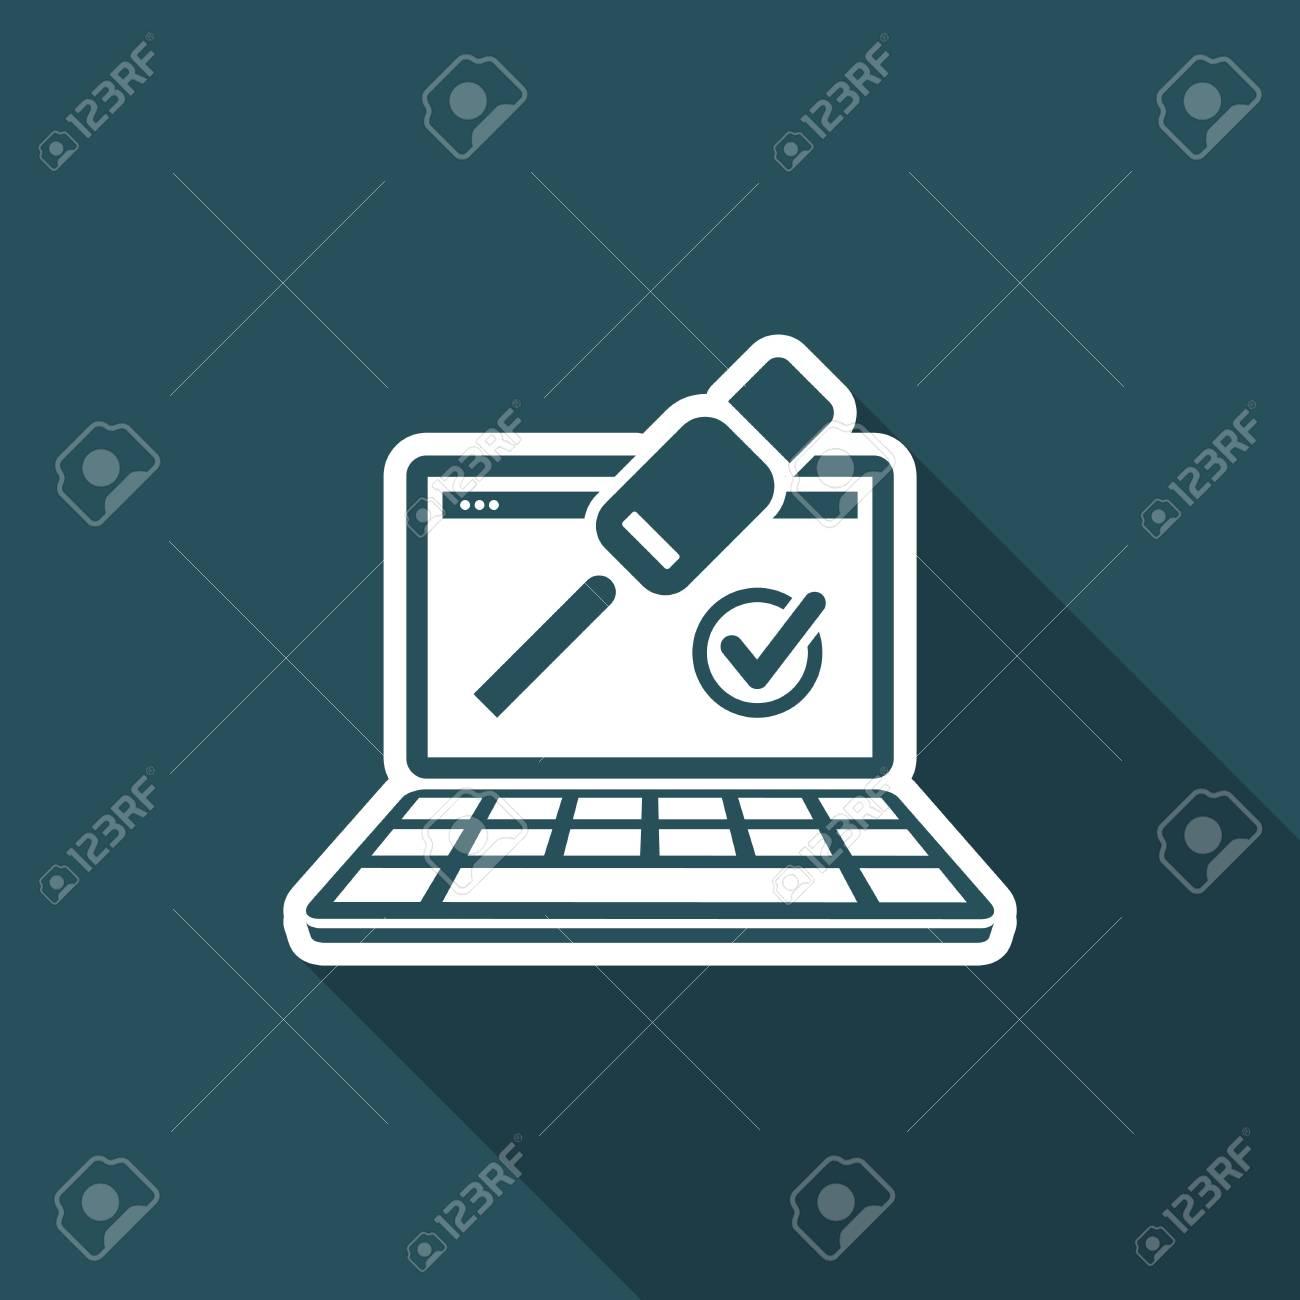 Check usb connection - Flat minimal icon - 74545347